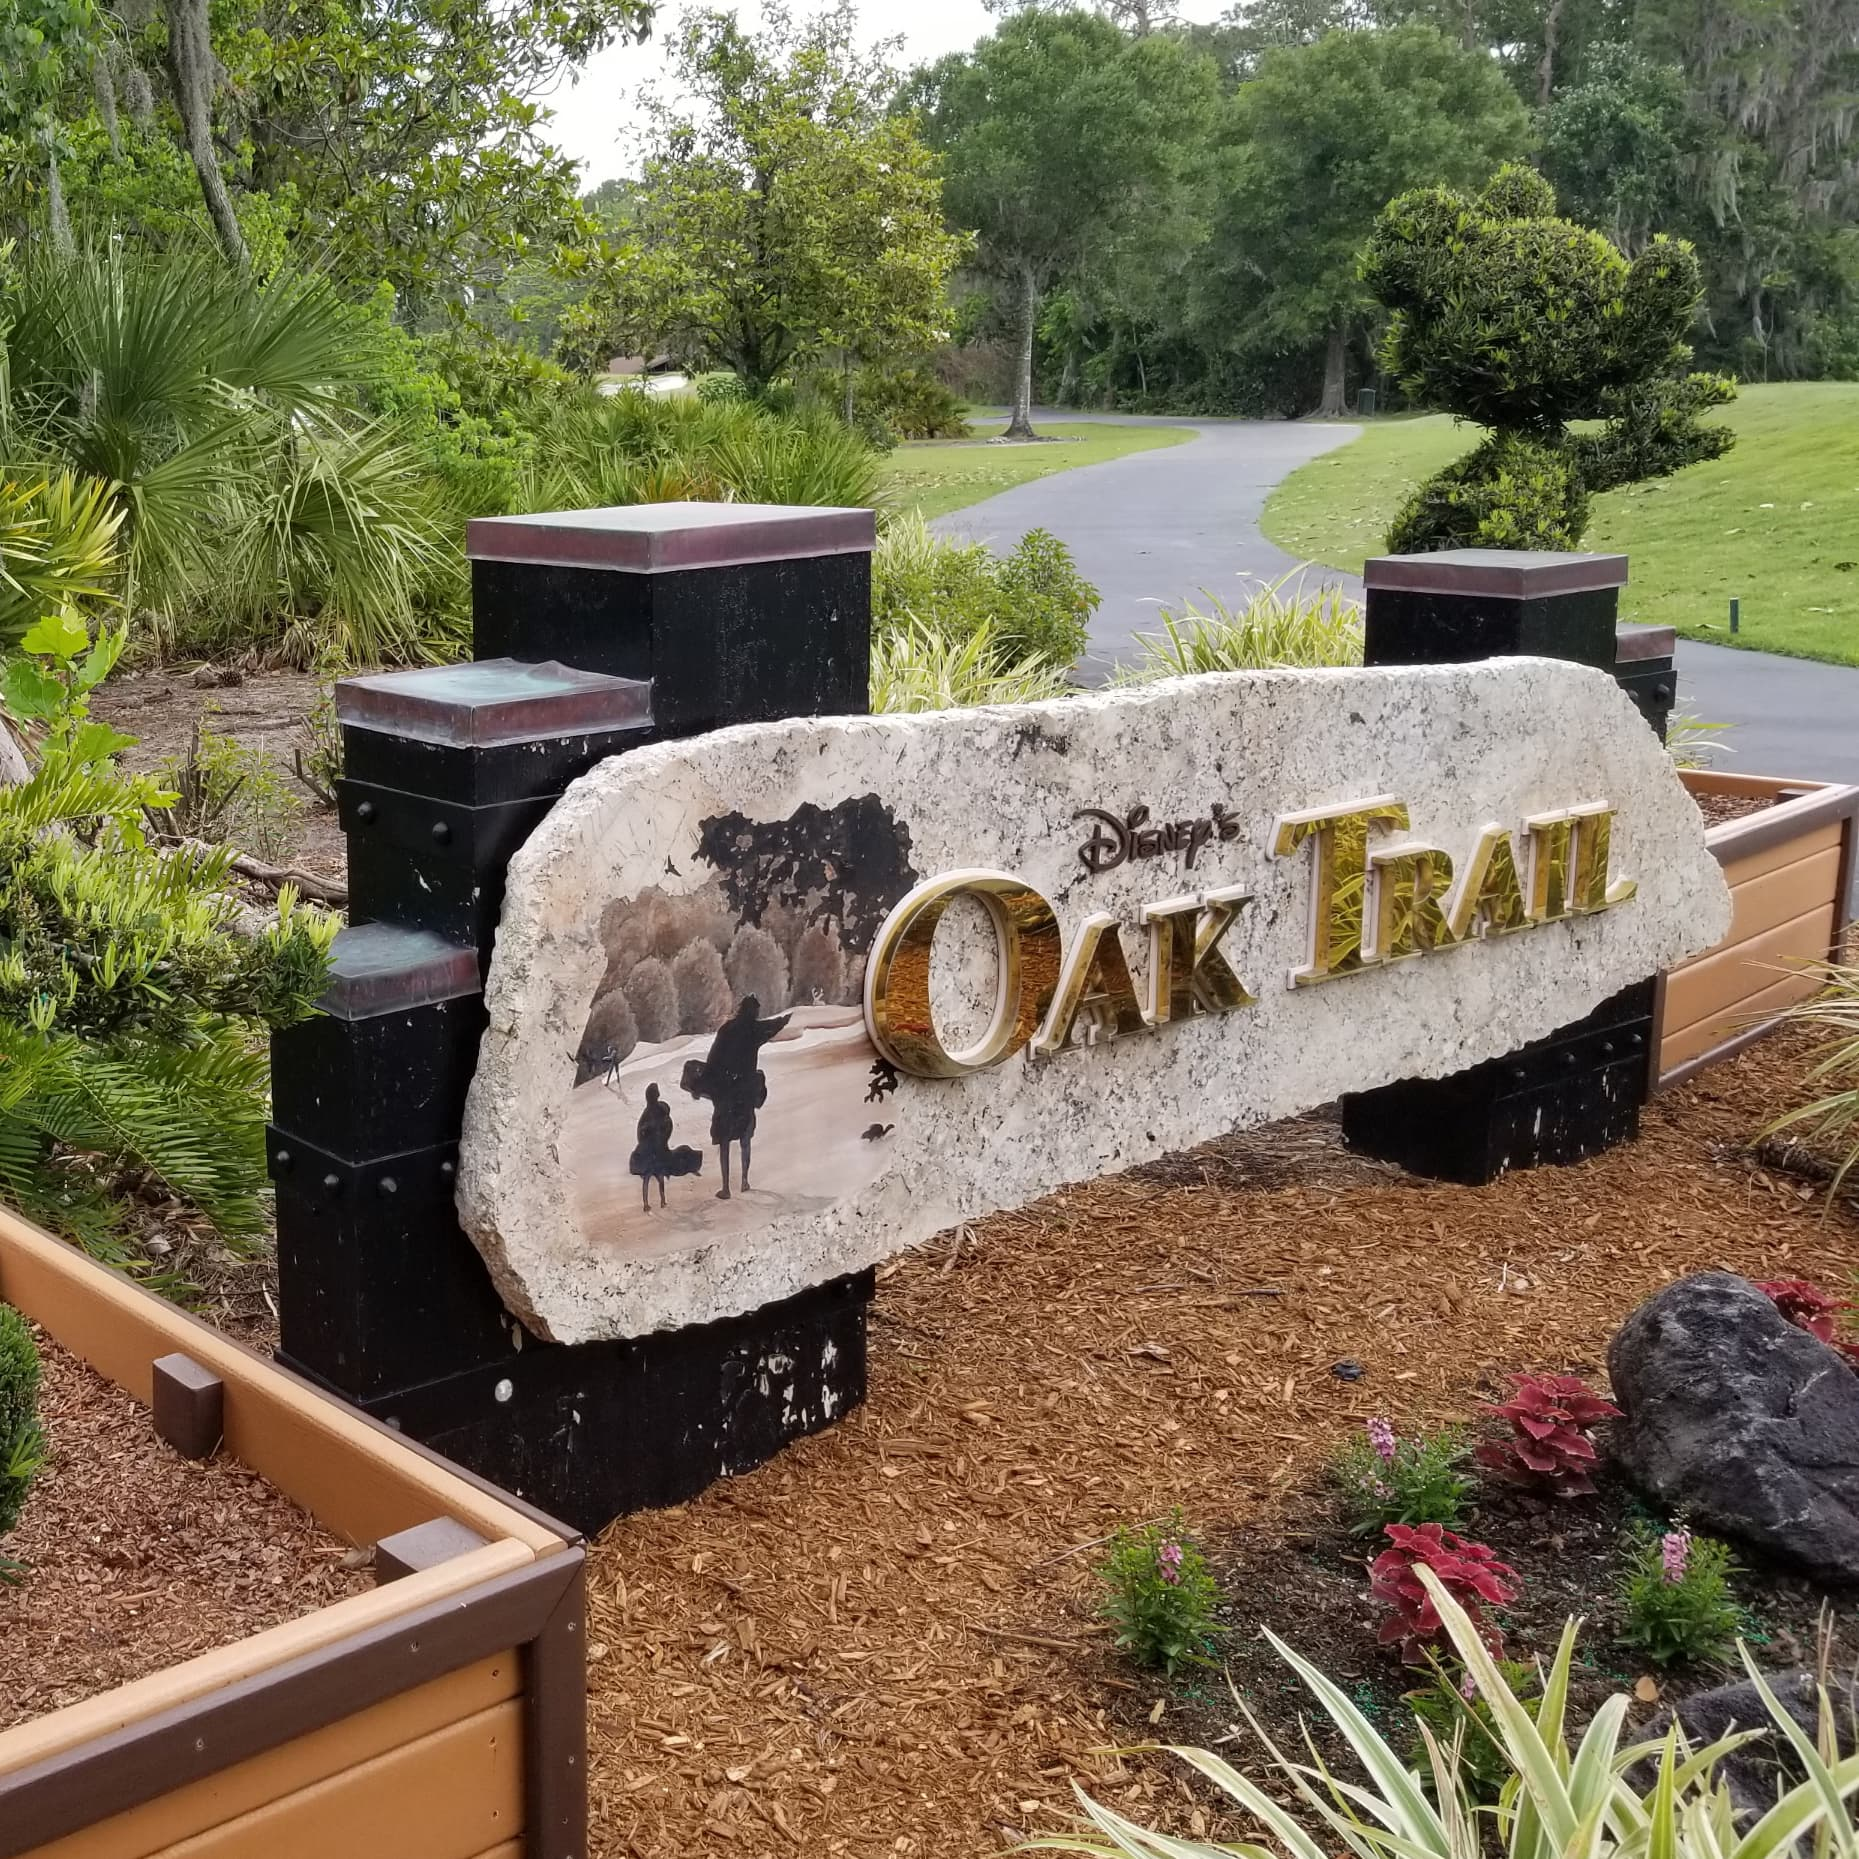 A sign that reads 'Disney's Oak Trail' located beside a golf cart path